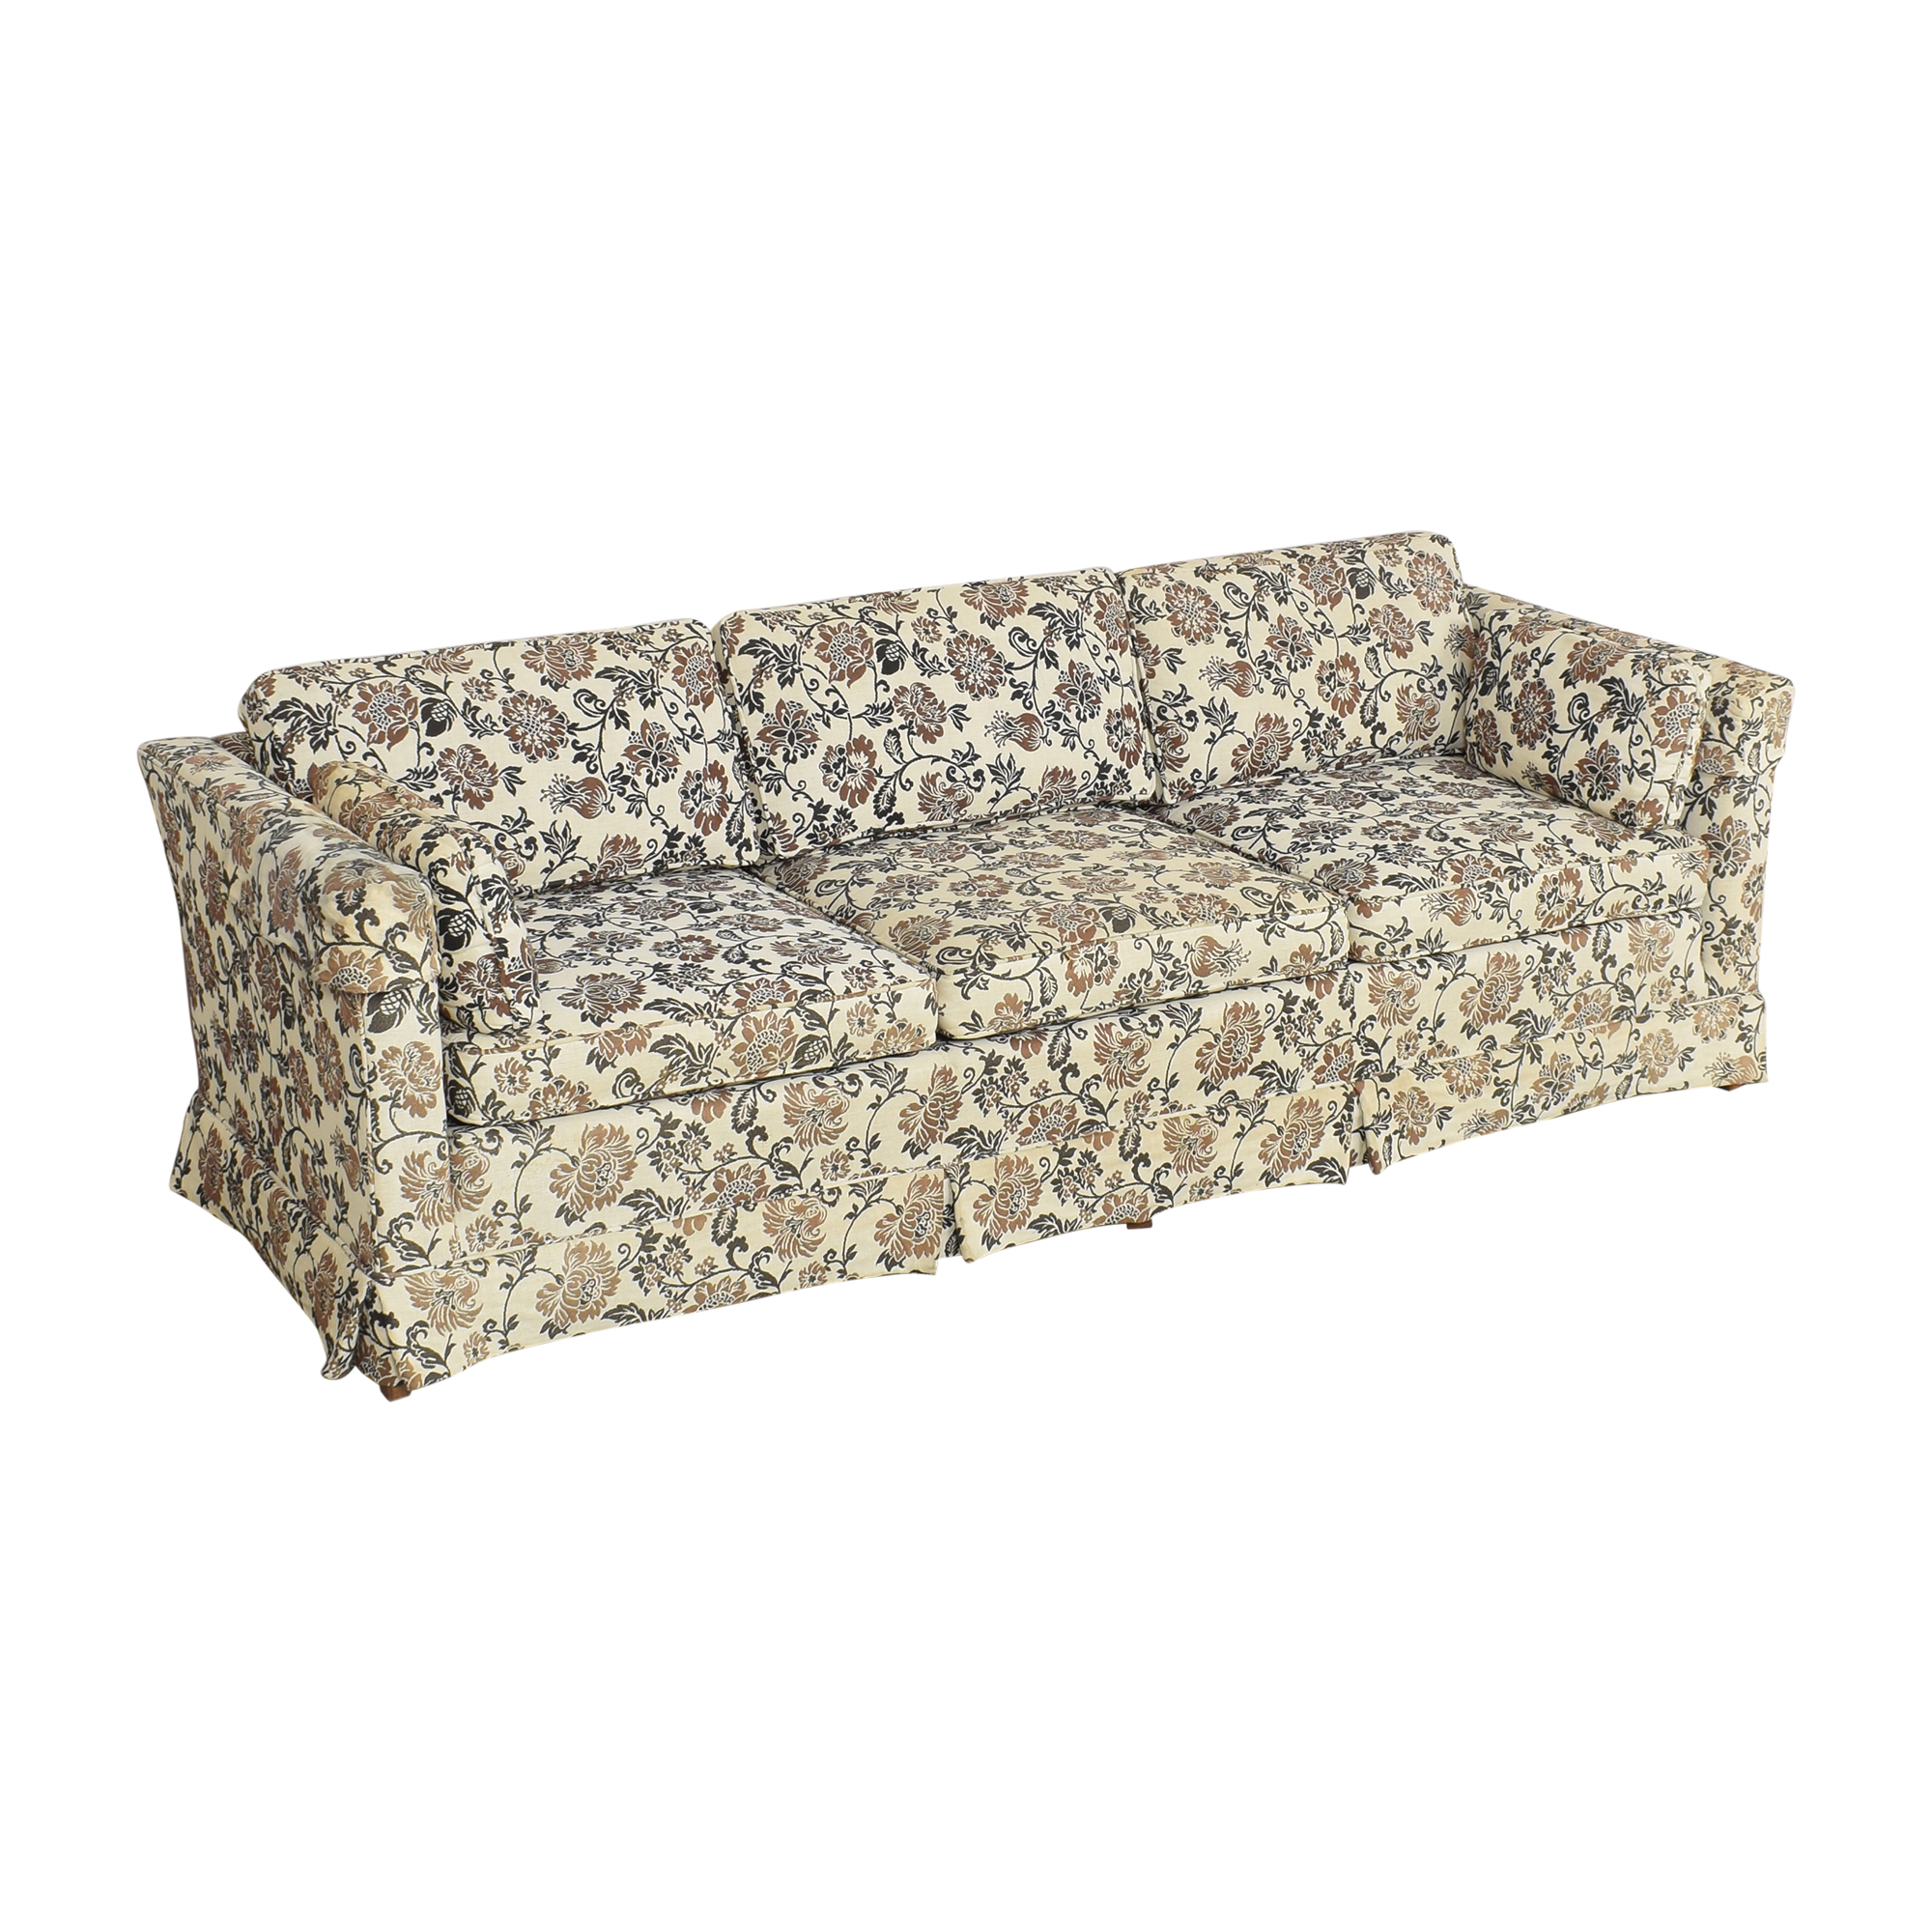 Ethan Allen Ethan Allen Skirted Three Cushion Sofa coupon